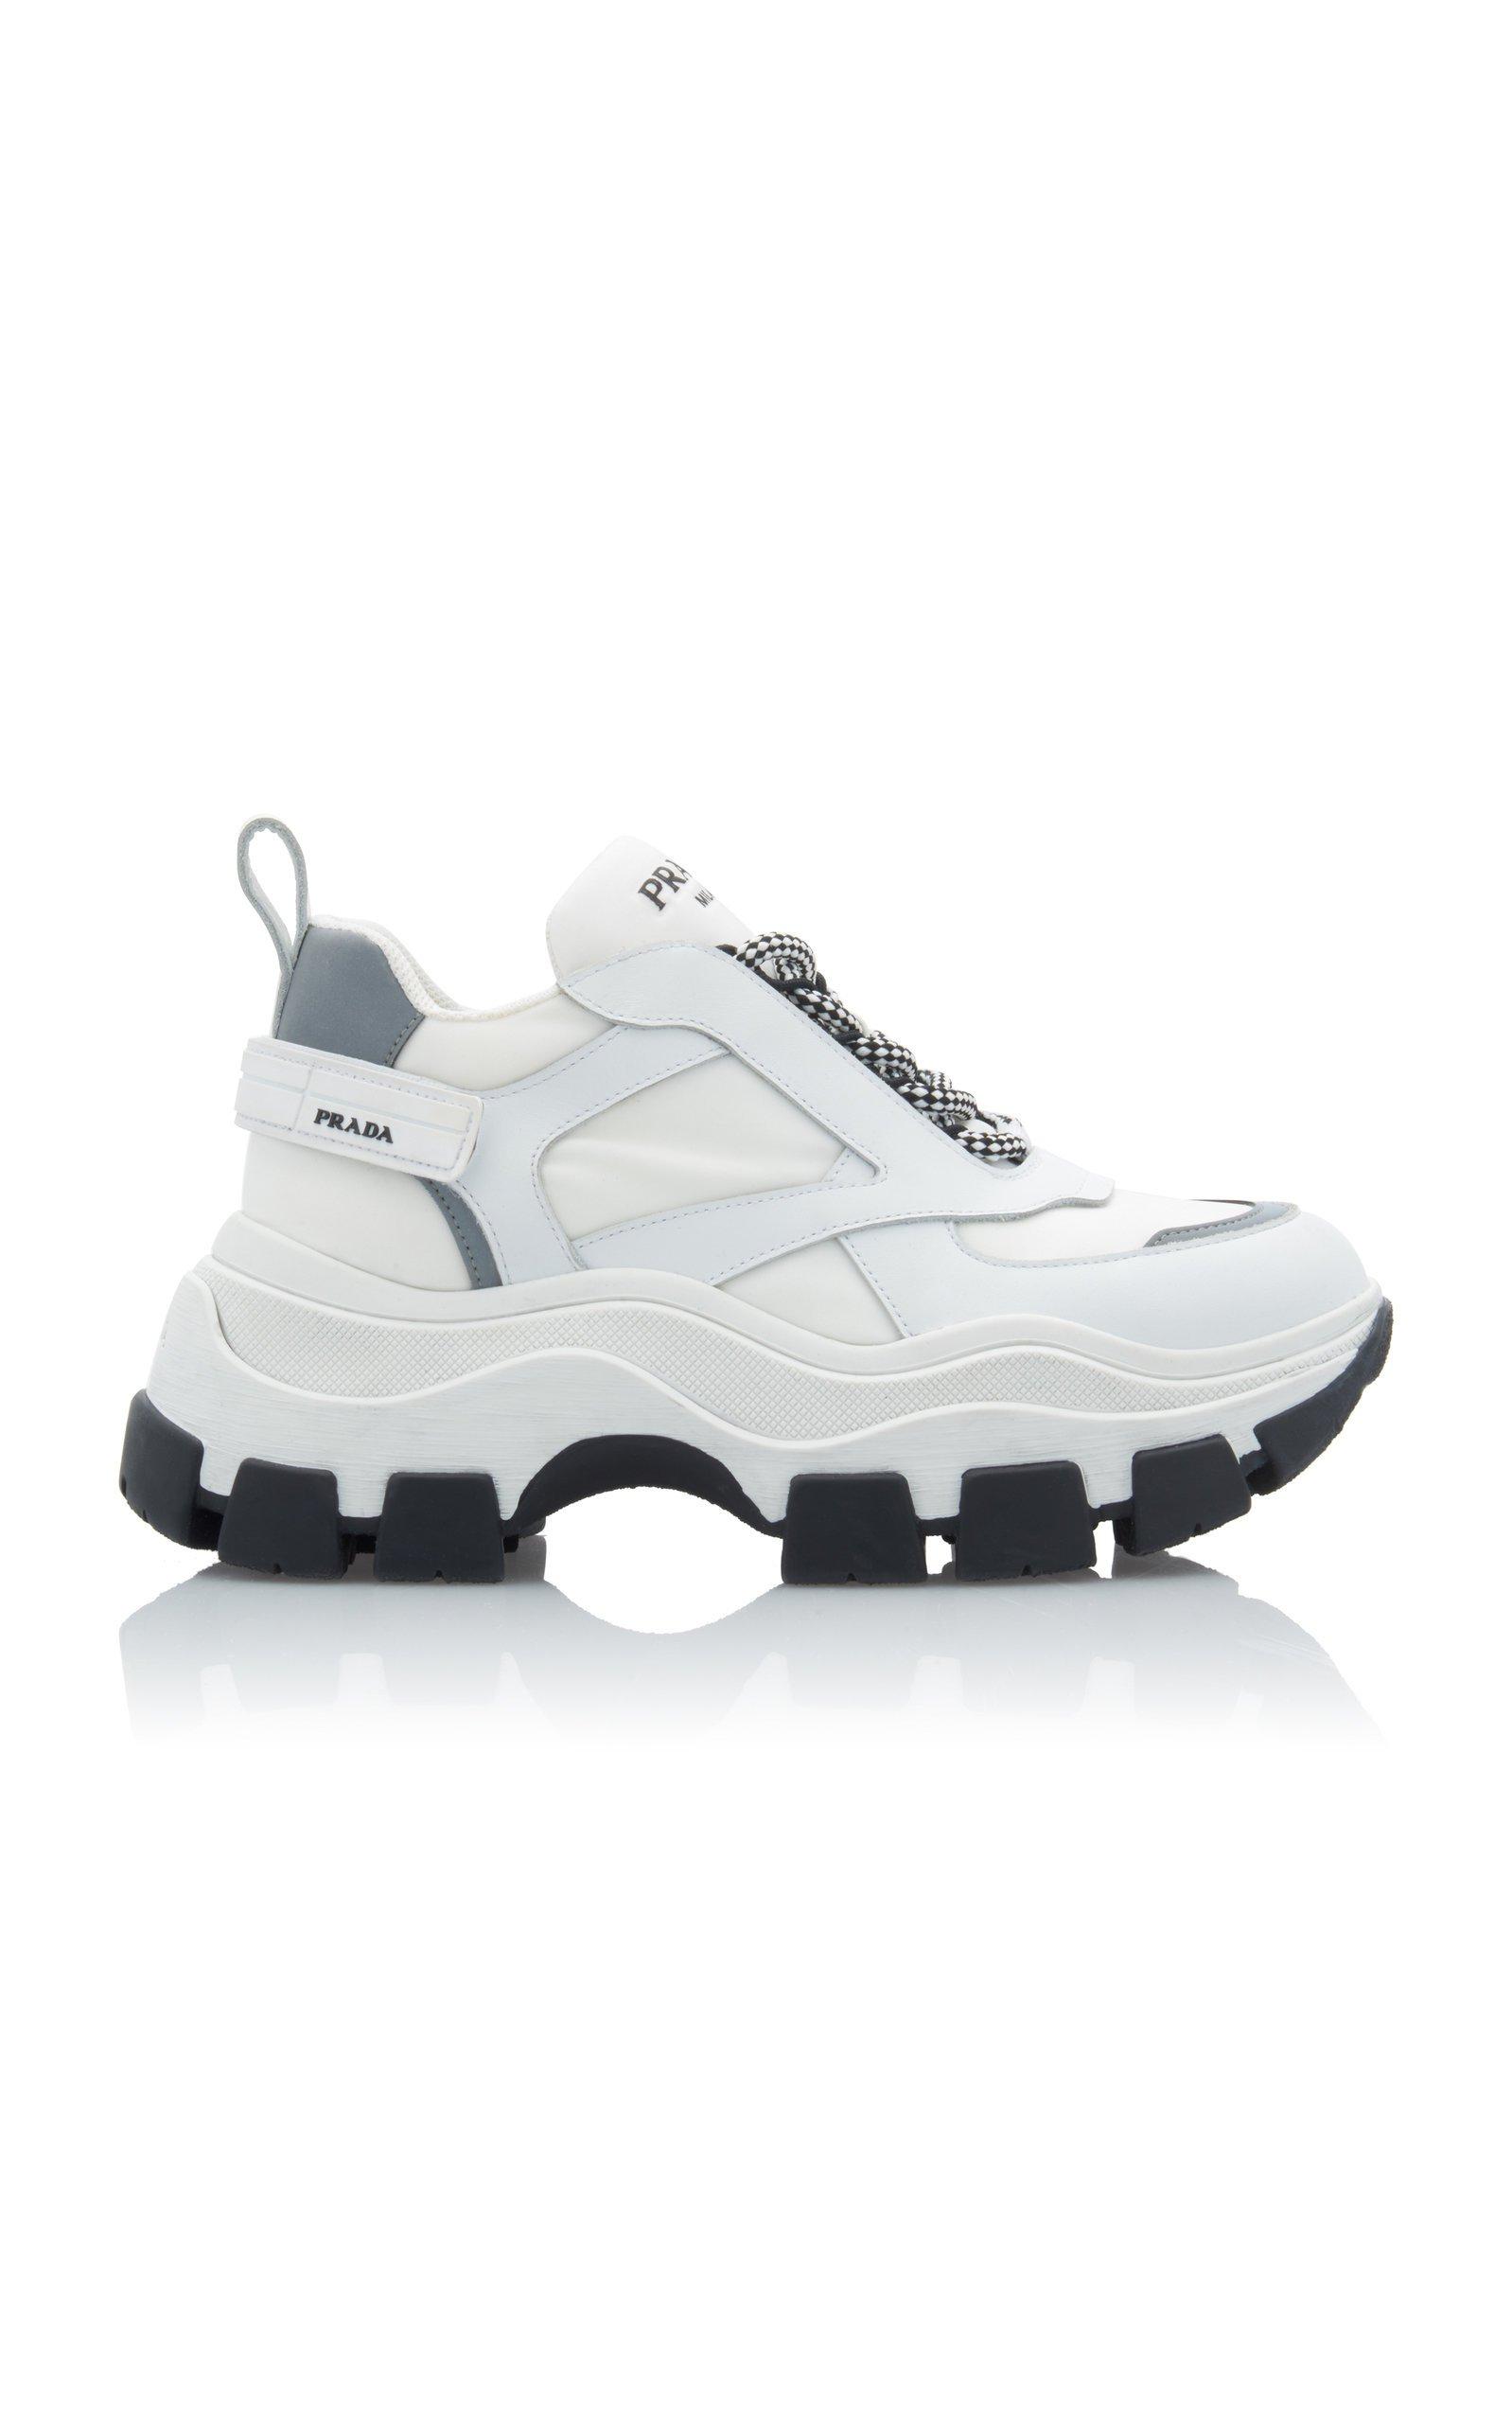 Leather And Rubber Platform Sneakers by Prada | Moda Operandi